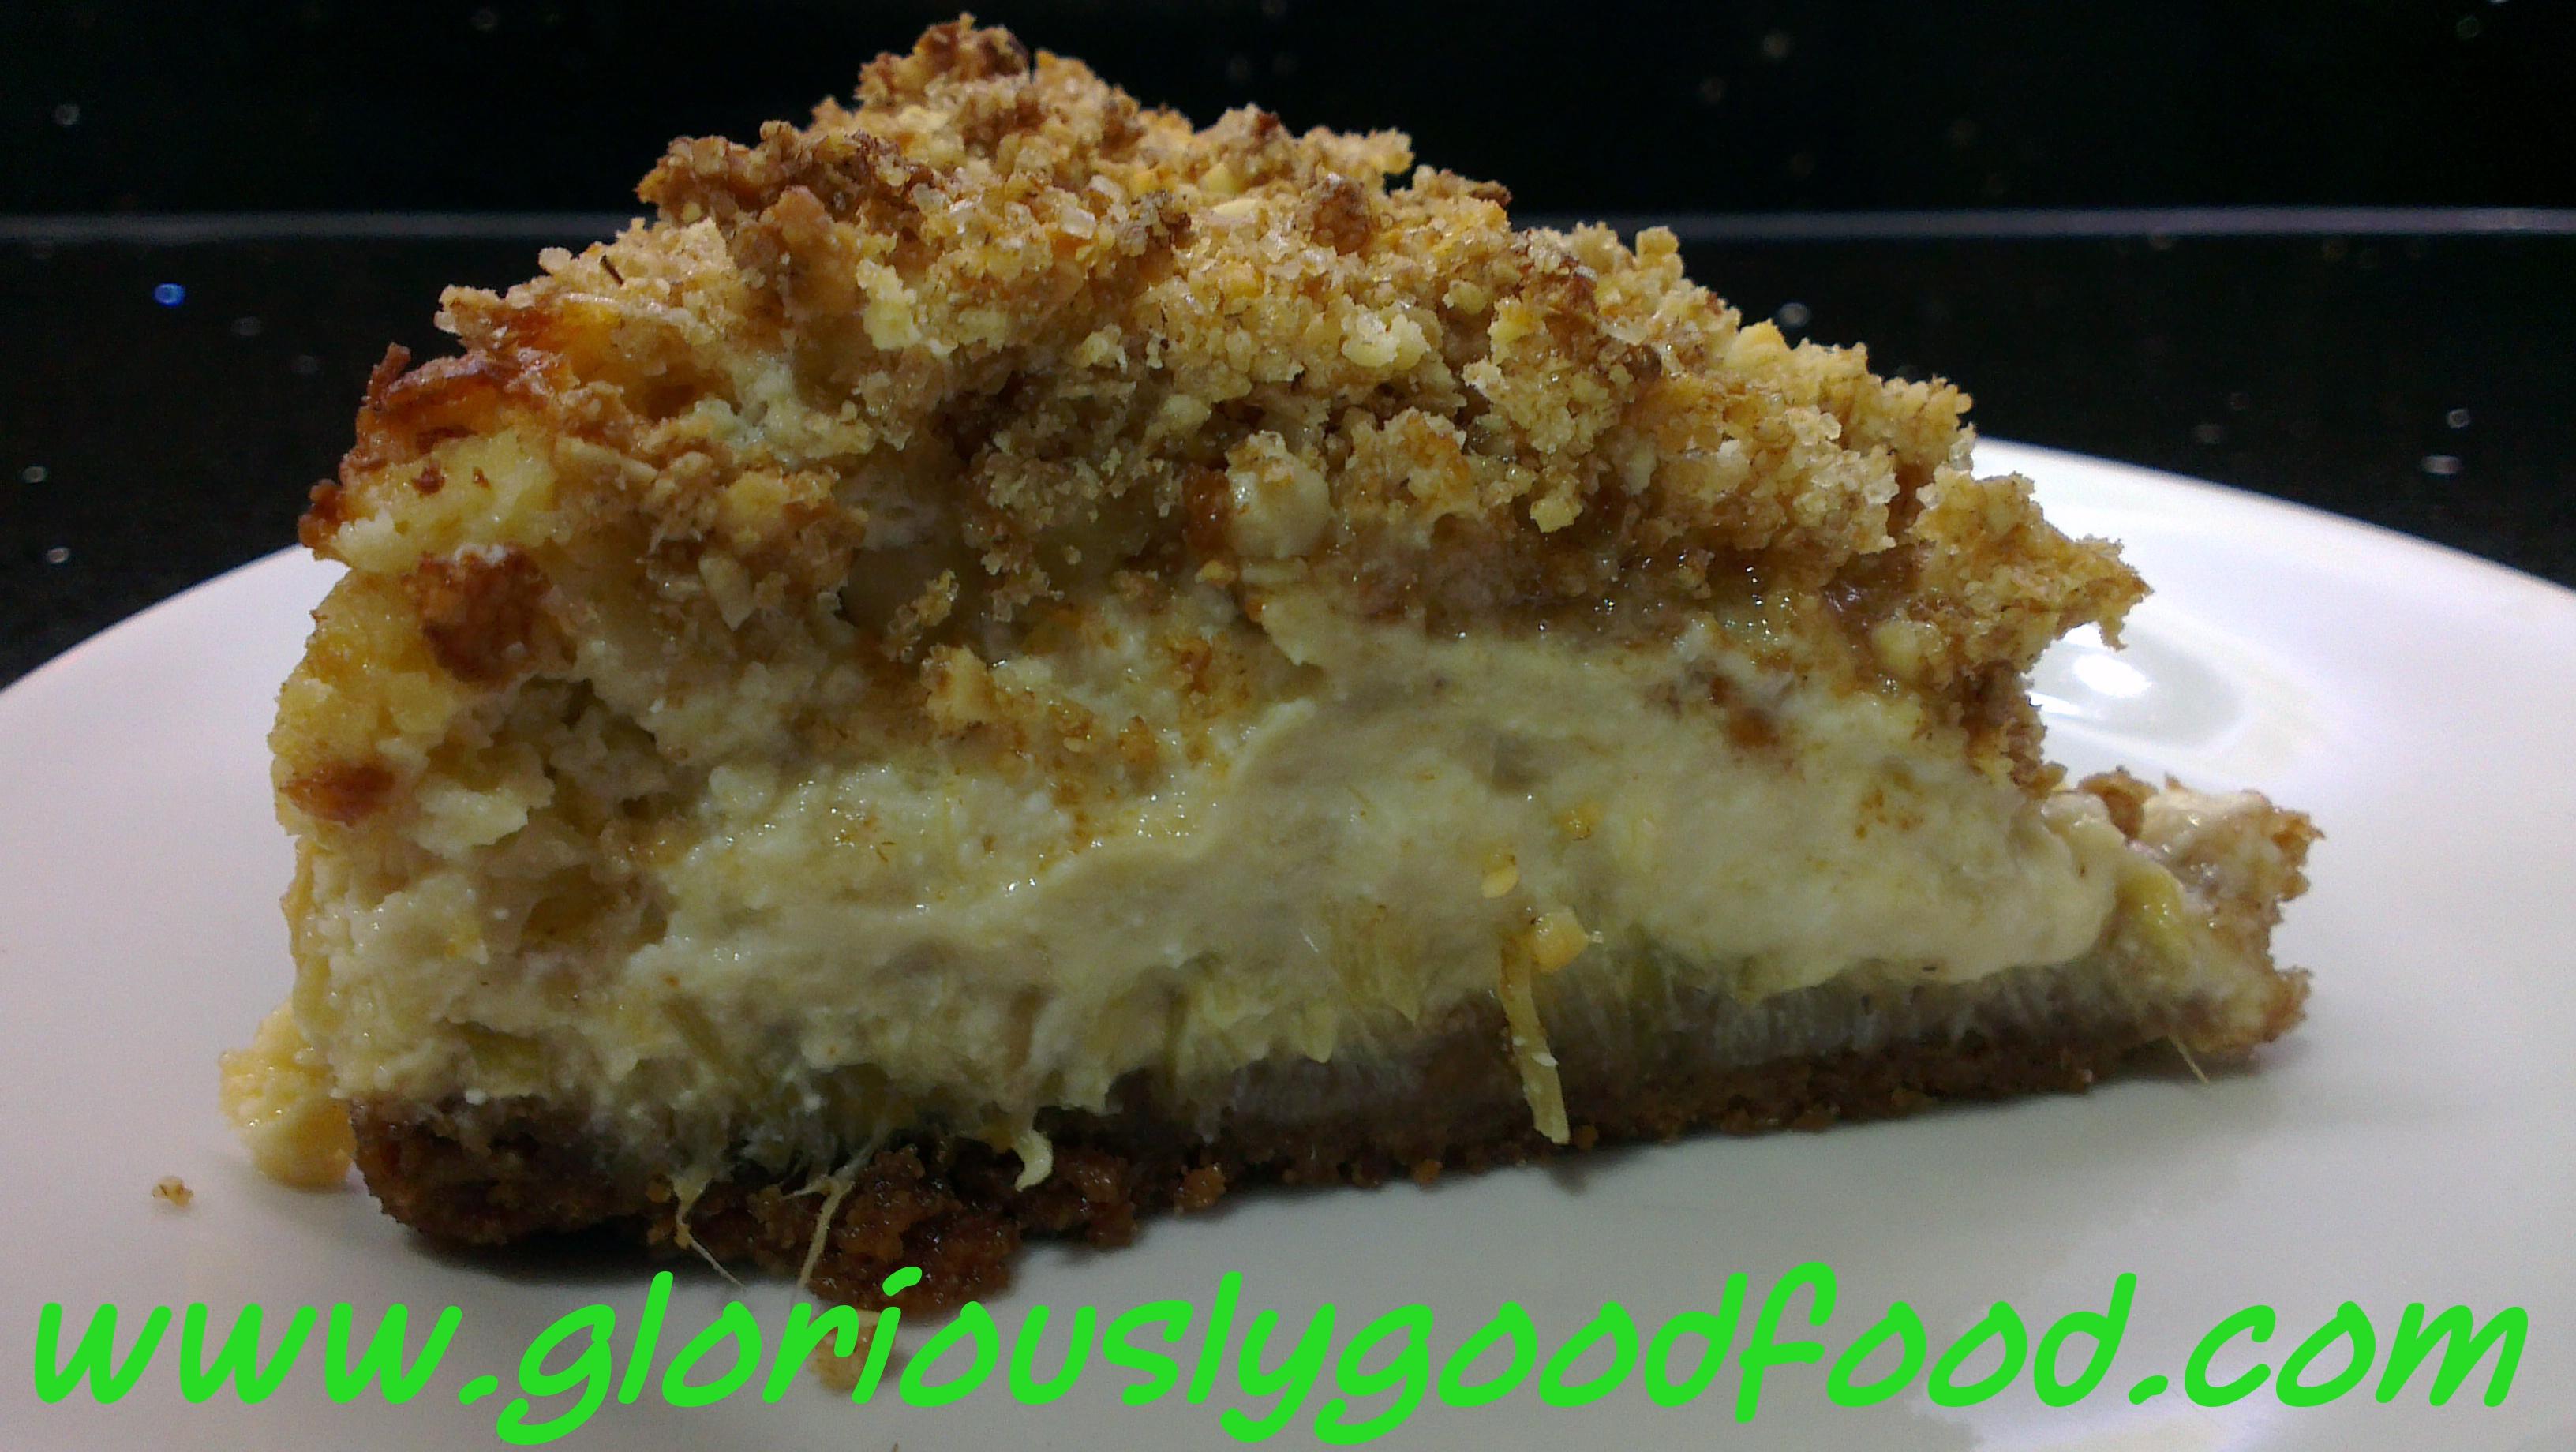 Food Glorious Food Recipes | Rhubarb and Ginger Crumble Cheesecake